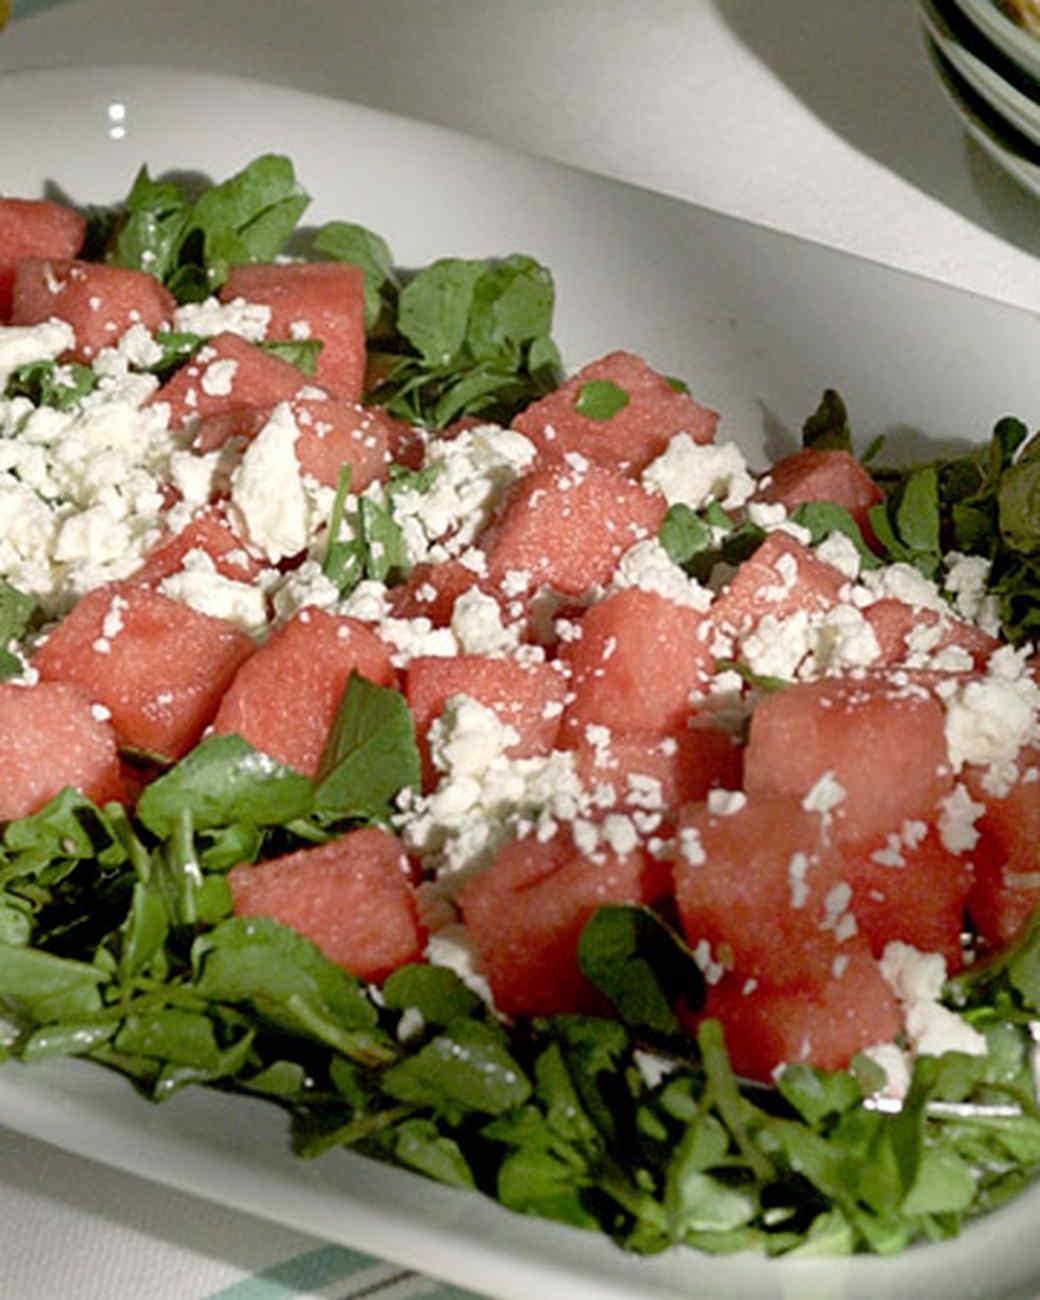 Melon and Cress Salad